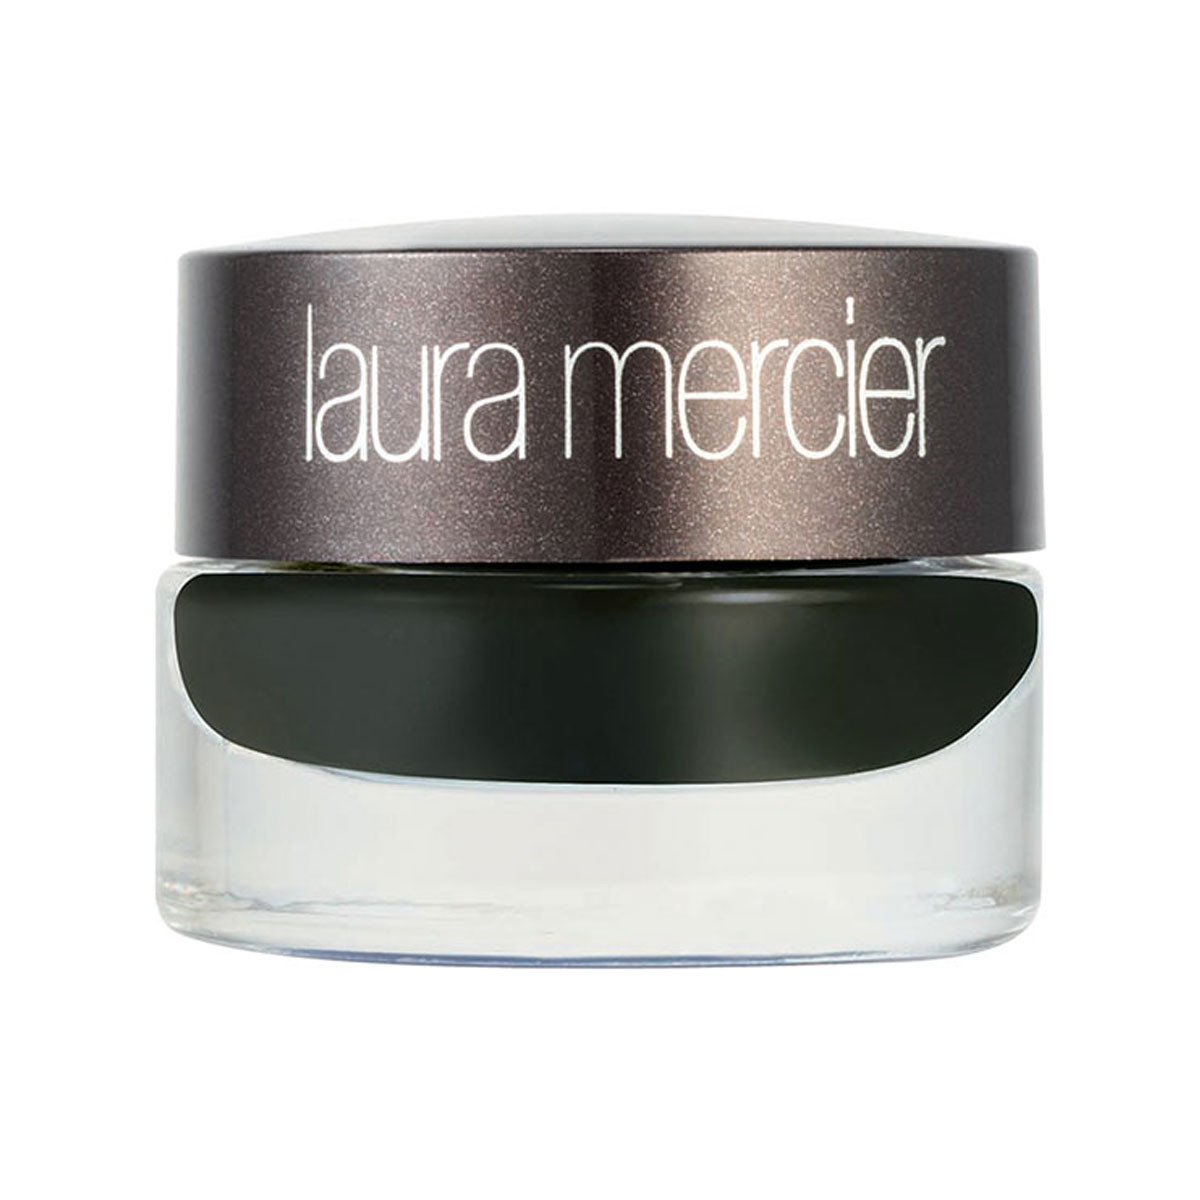 Laura Mercier Creme Eye Liner in Noir